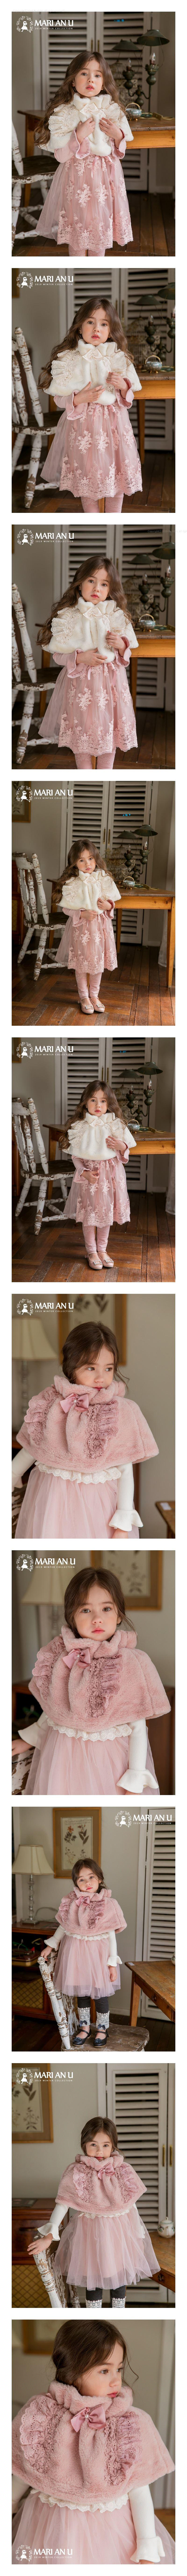 MARI AN U - Korean Children Fashion - #Kfashion4kids - Marie Mink Cape